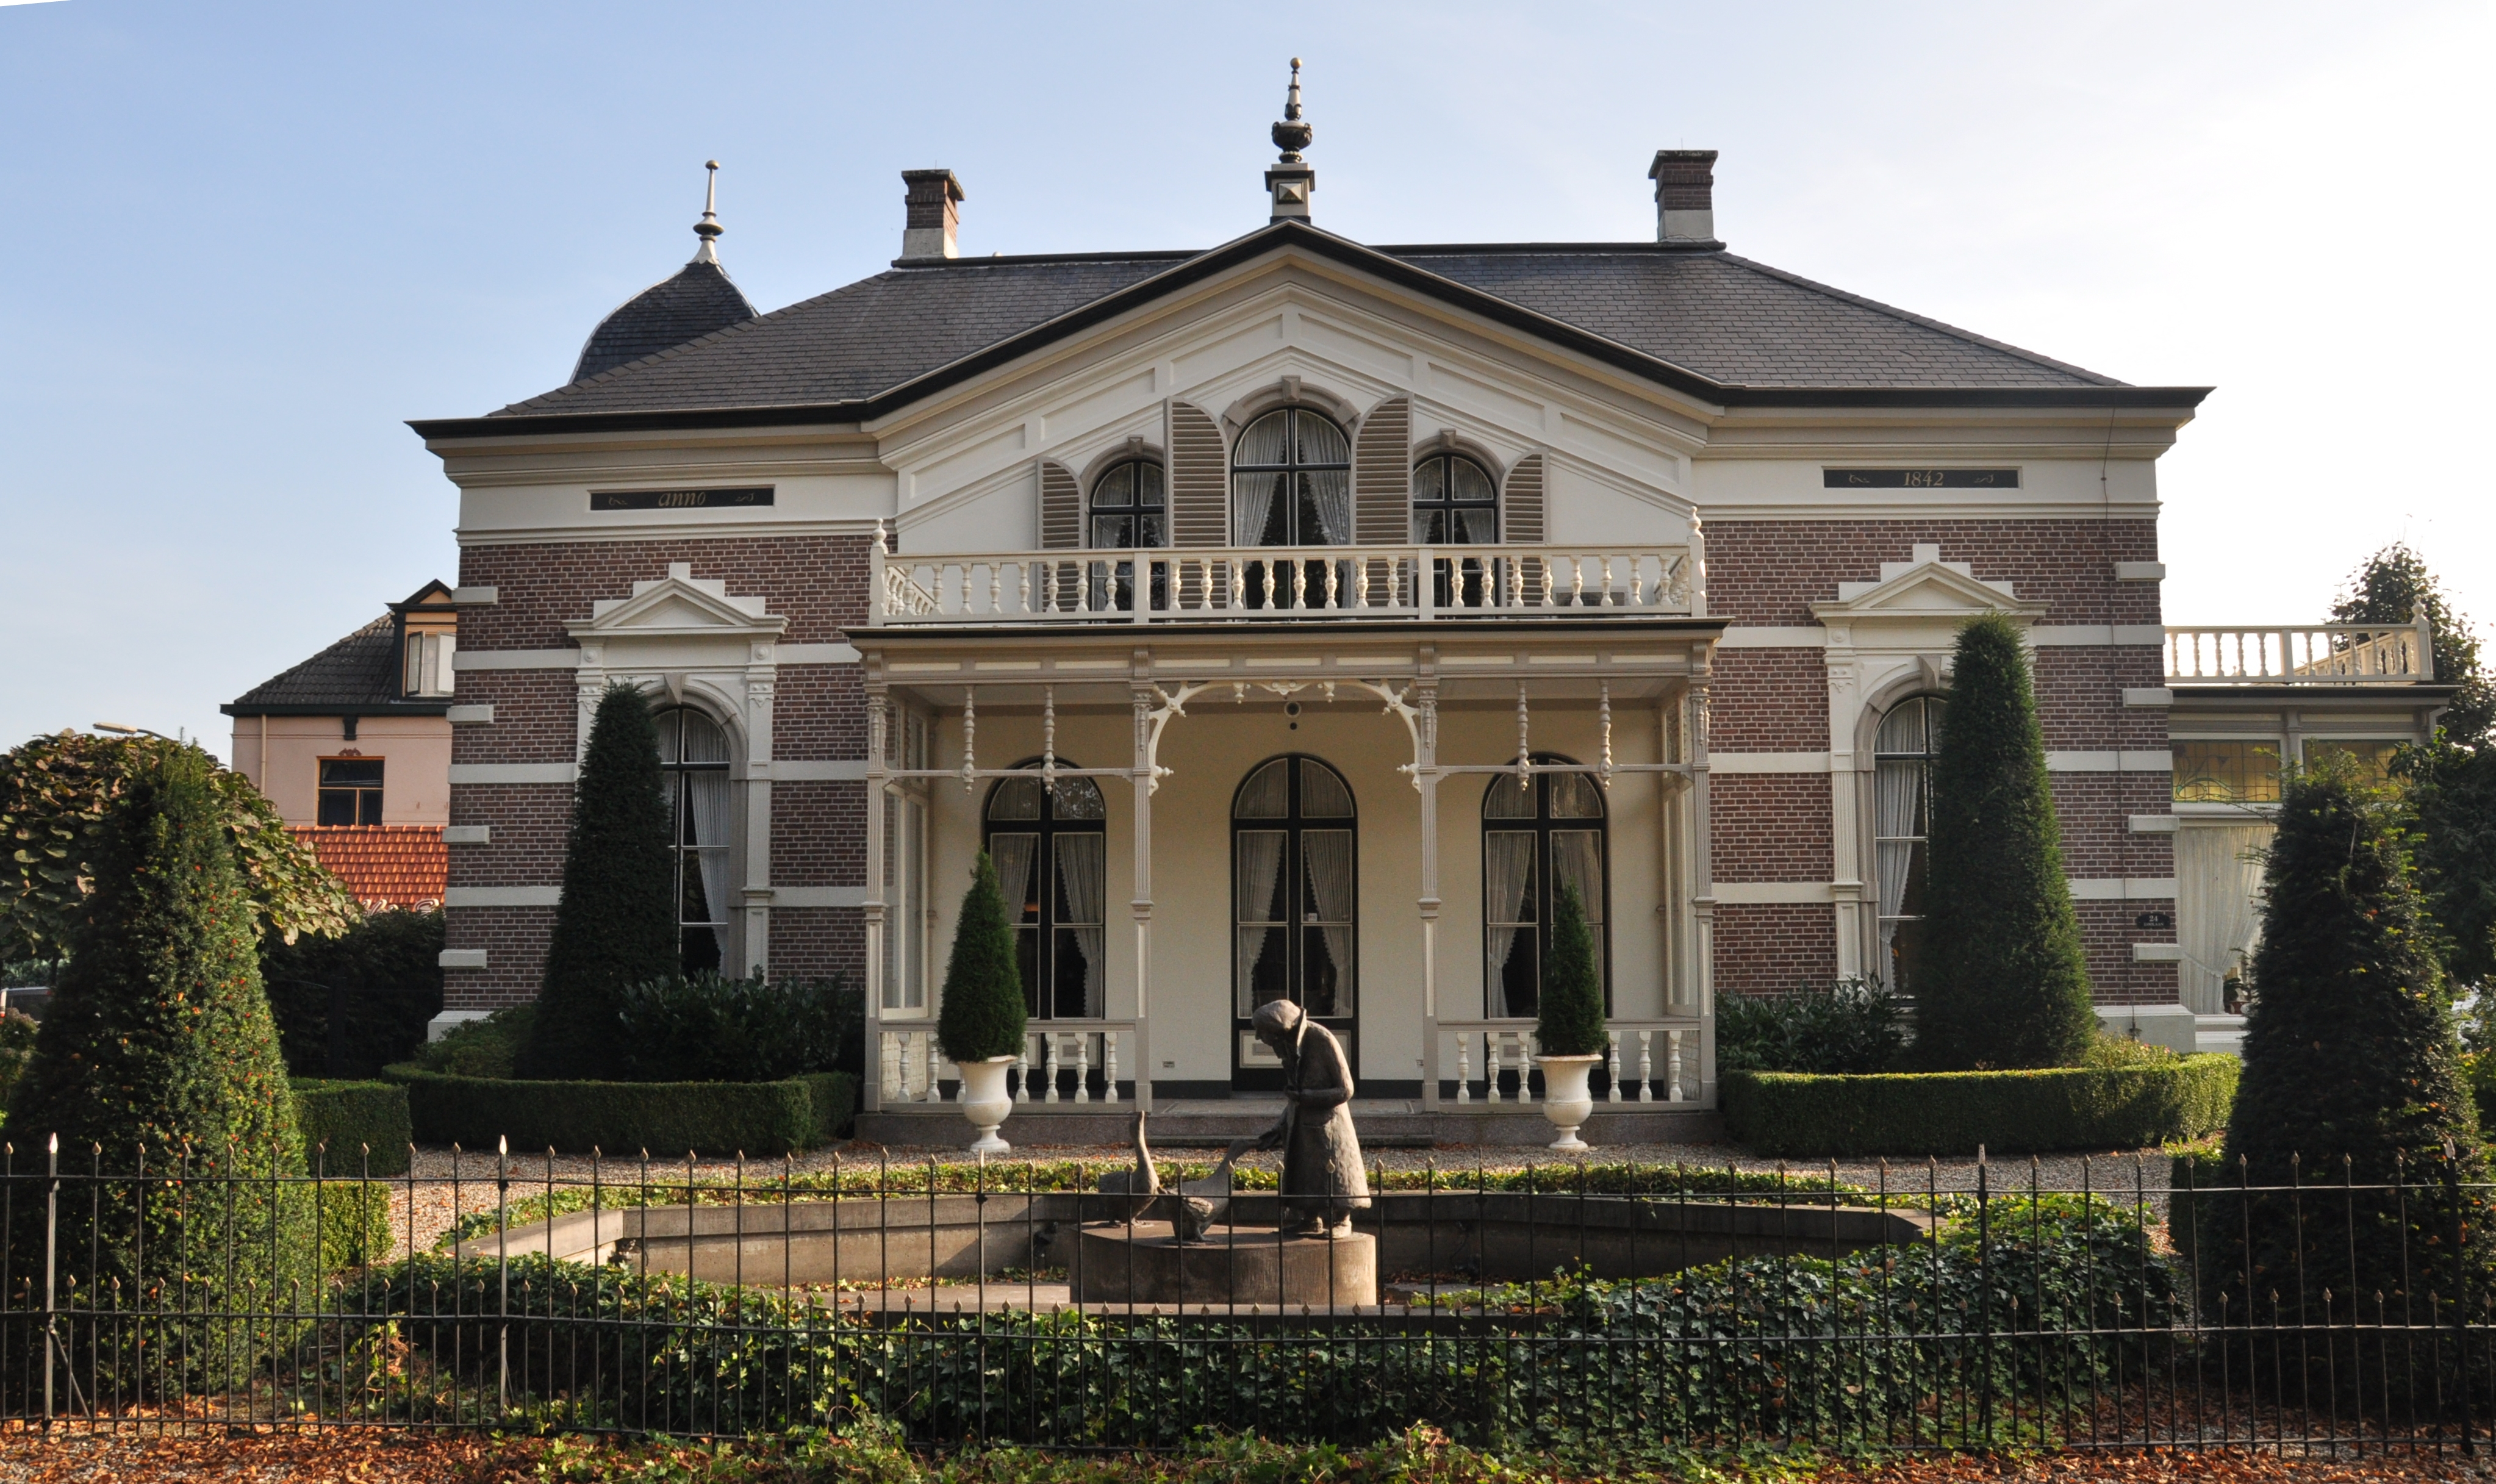 Grote vrijstaande villa in apeldoorn monument for Grote villa